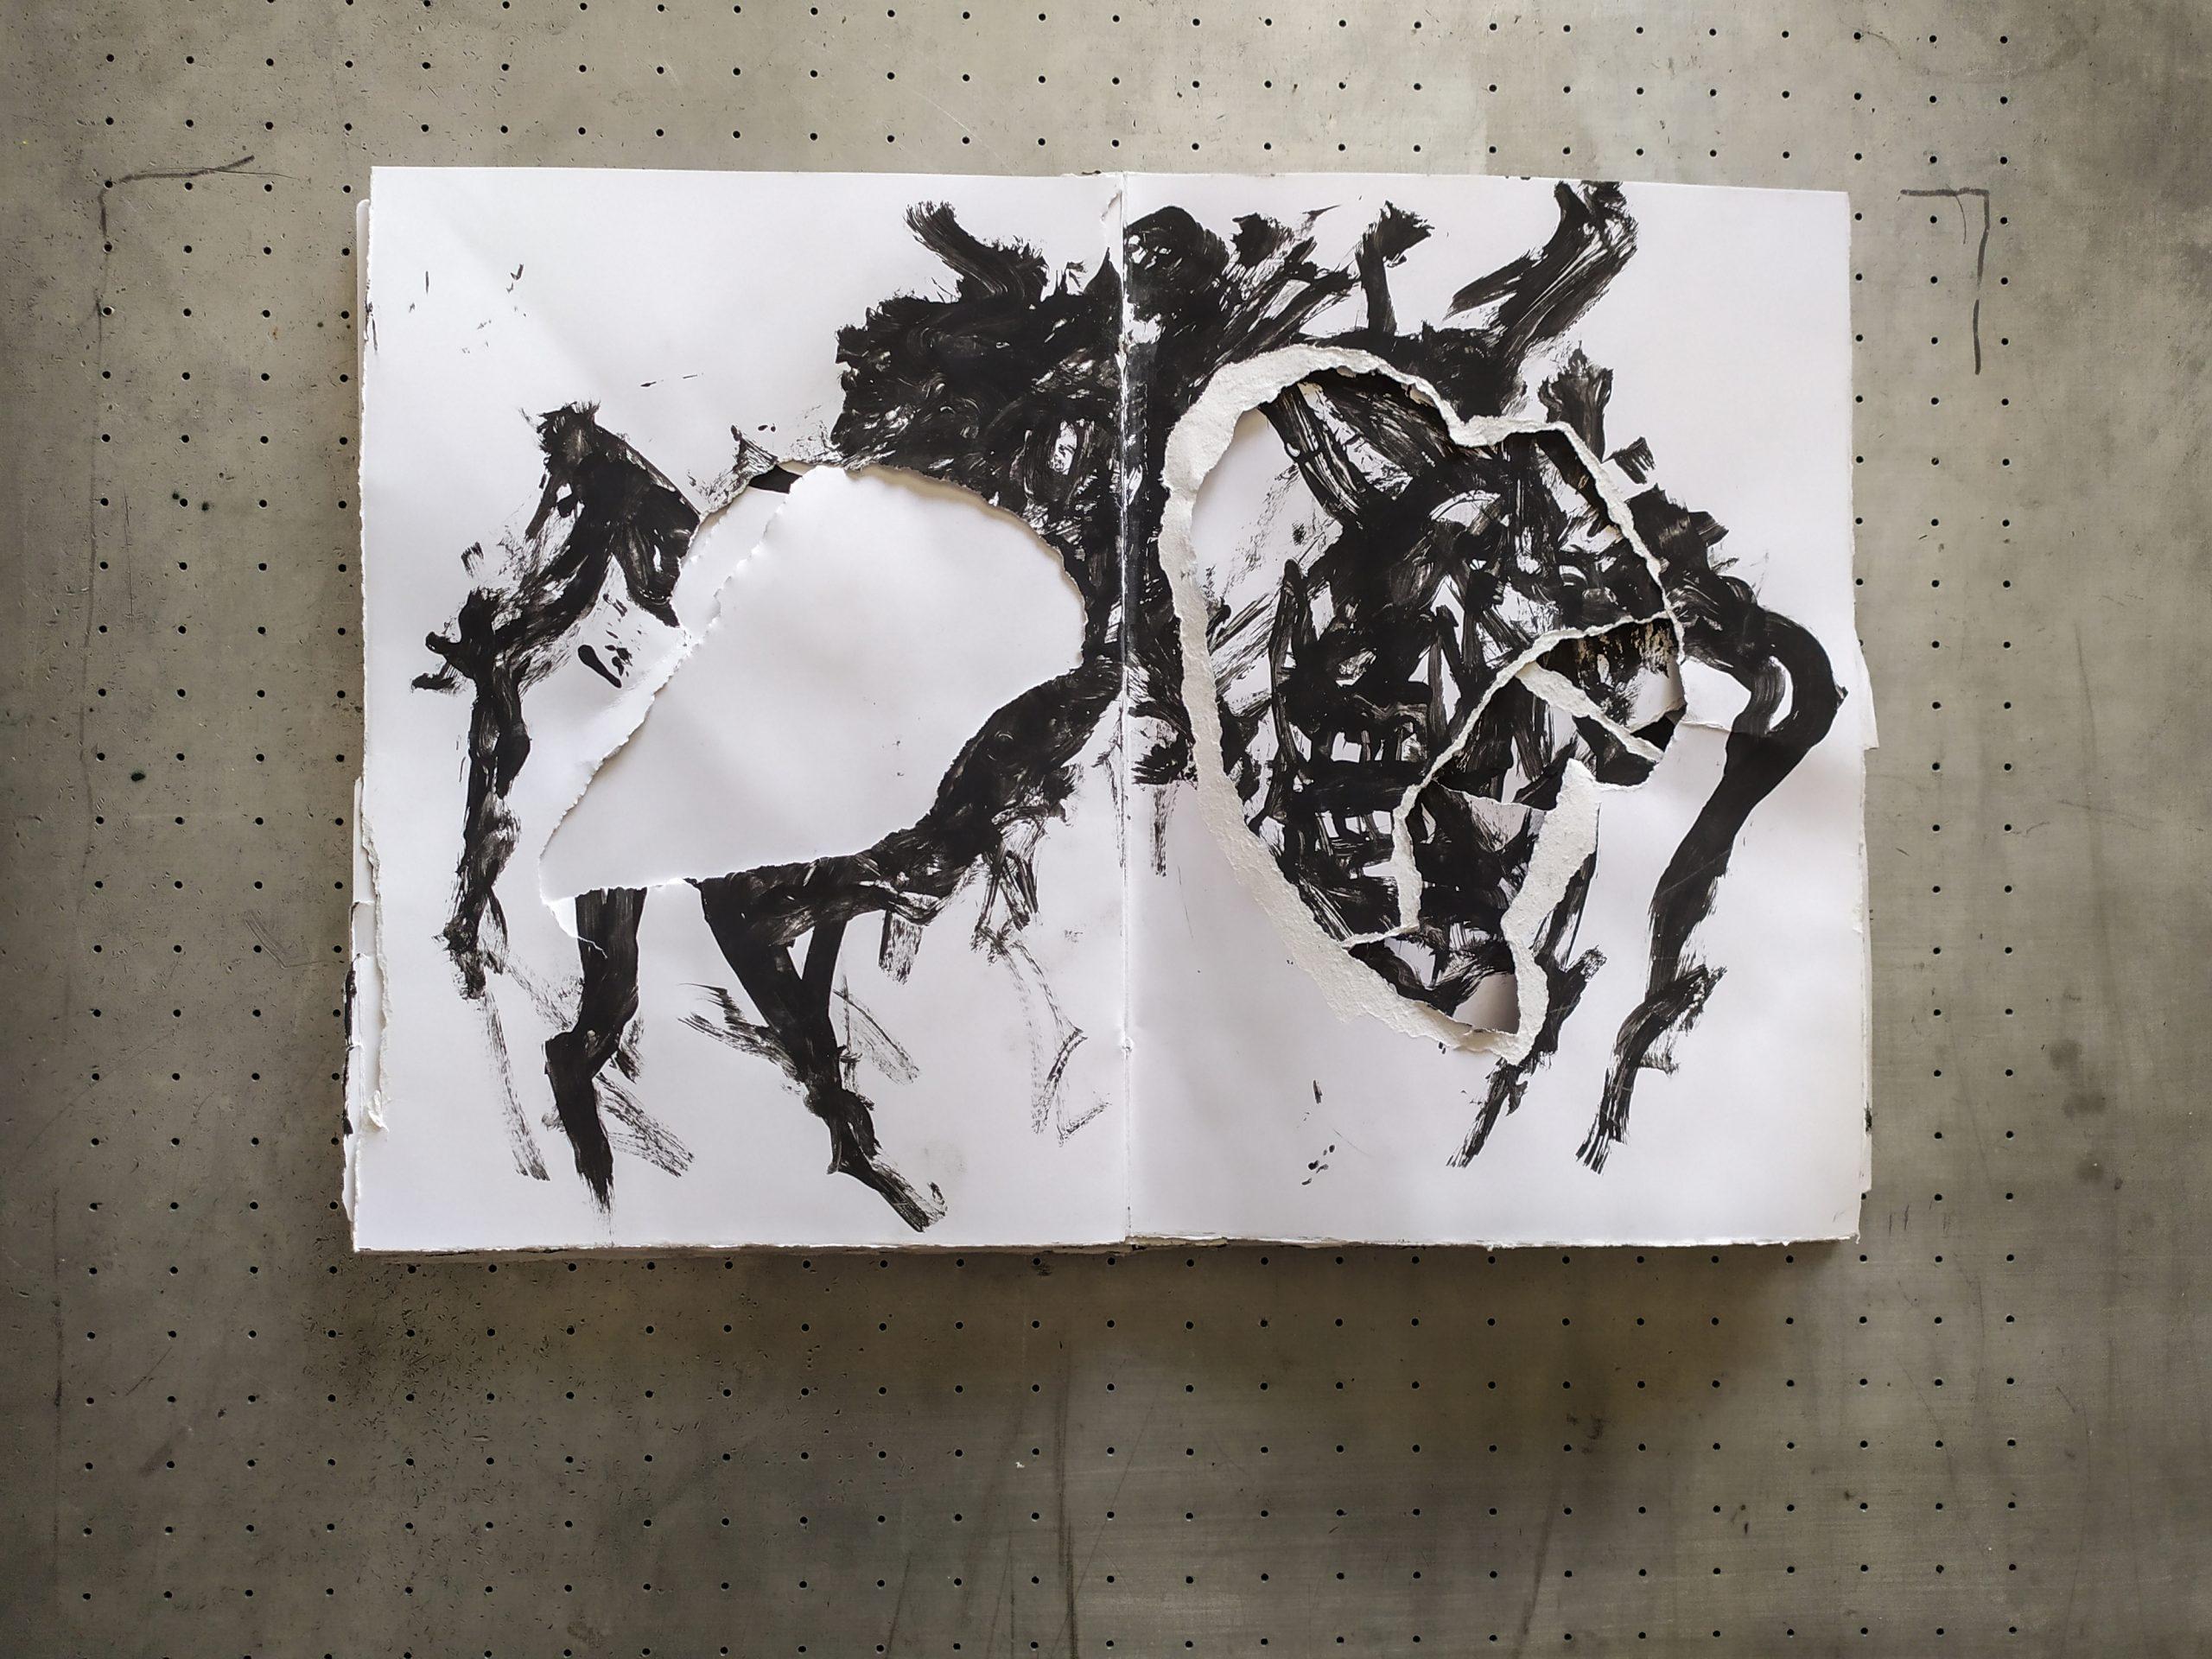 artistbook-sep-2021-carloszorromono-21